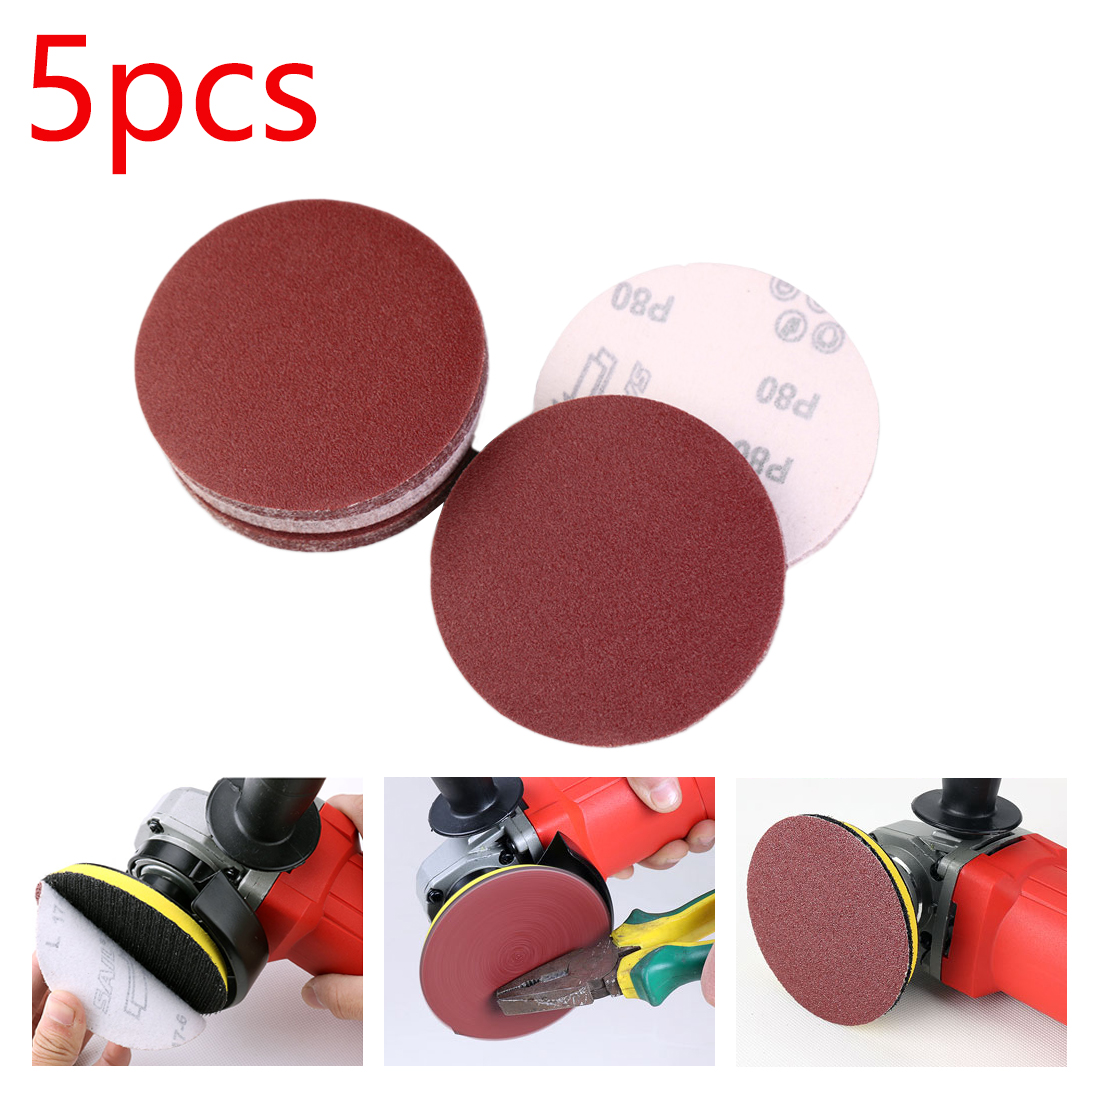 Low Price 5pcs 125 Mm Round Sandpaper Disk Sand Sheets Grit 80-1000 Hook Loop Sanding Disc For Sander Grits Red Polishing Discs